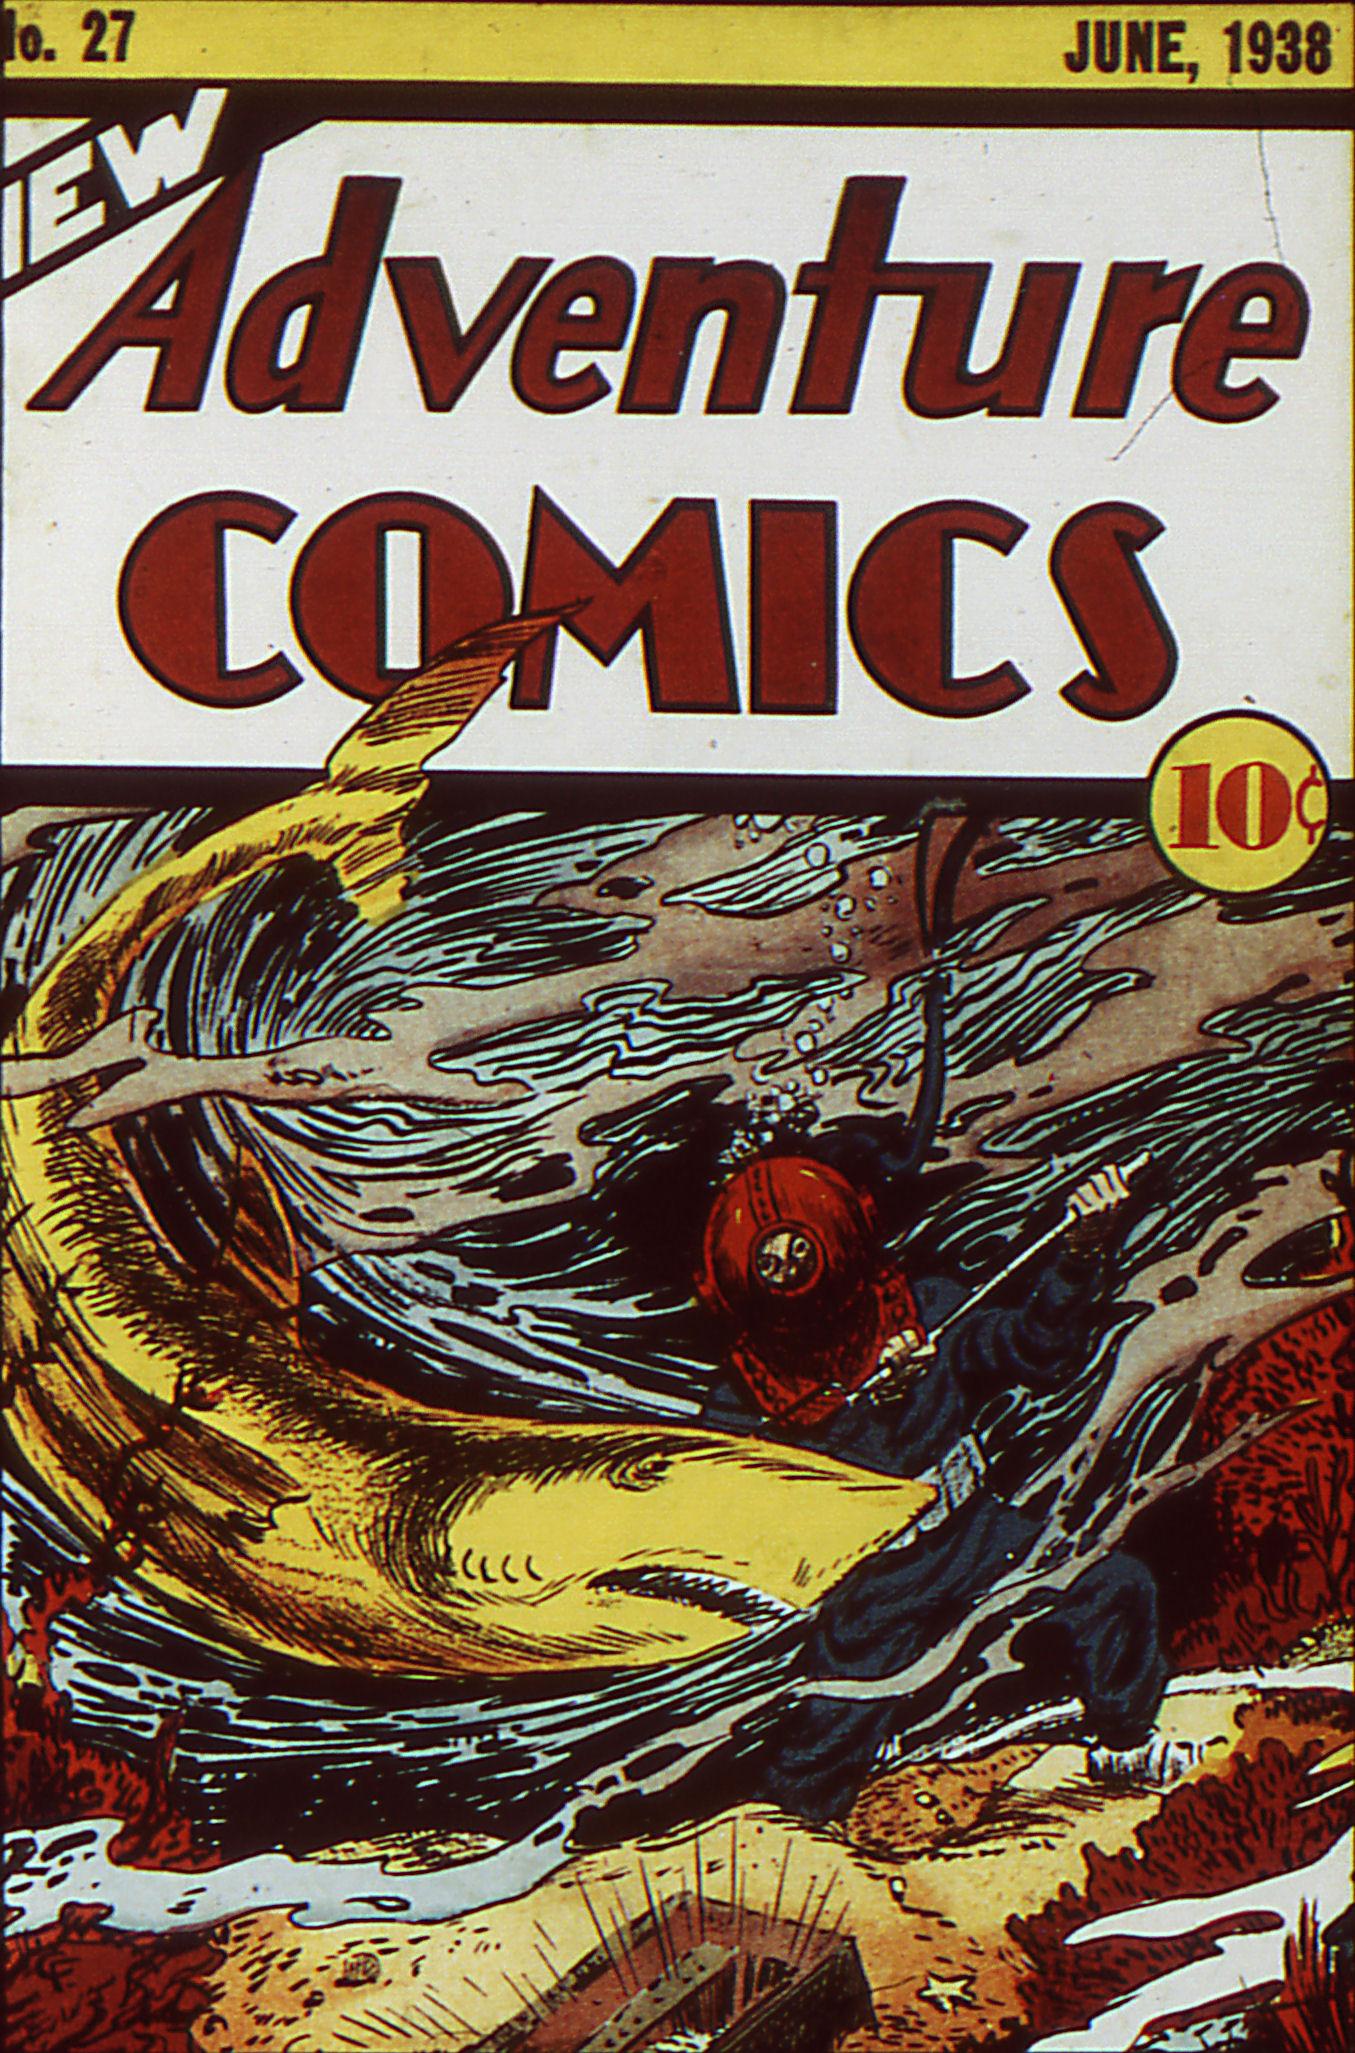 Read online Adventure Comics (1938) comic -  Issue #27 - 1